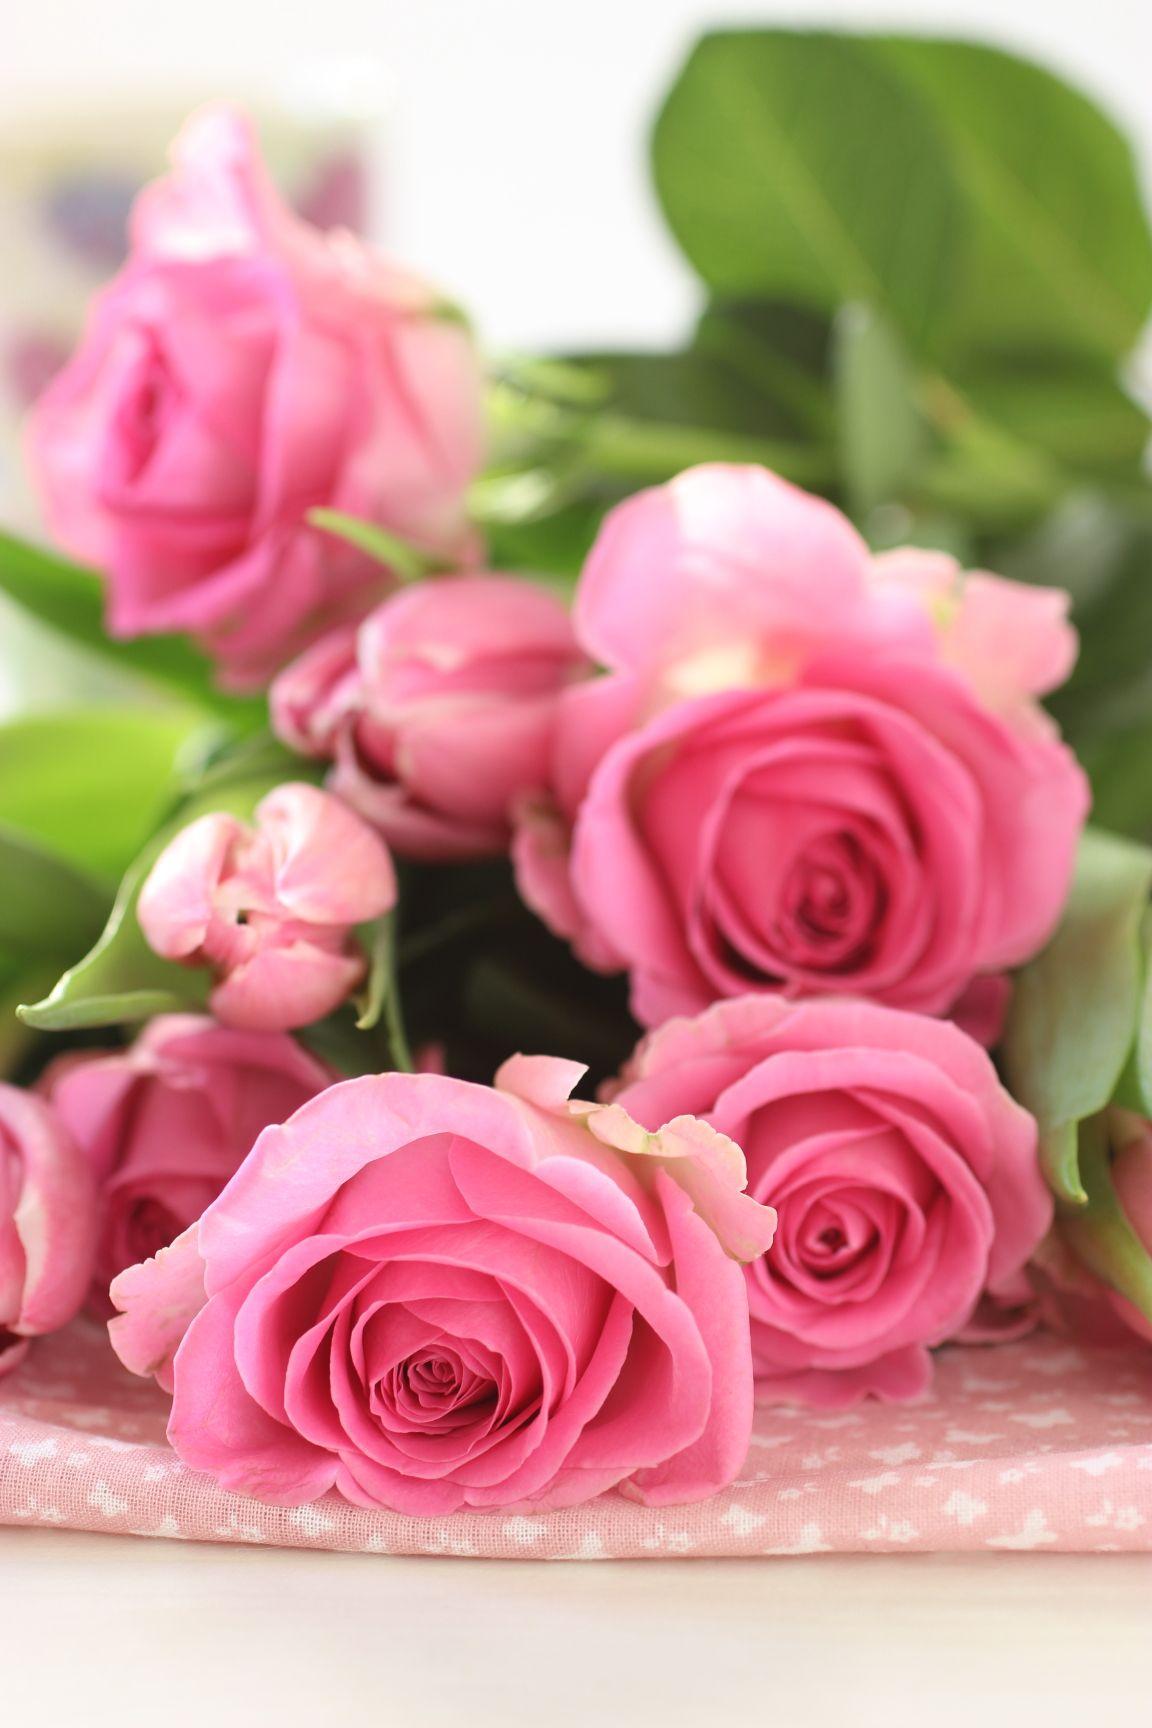 Roses Spring Pink Rose Flower Wallpaper Amazing Flowers Beautiful Roses Fantastic beautiful flower wallpaper